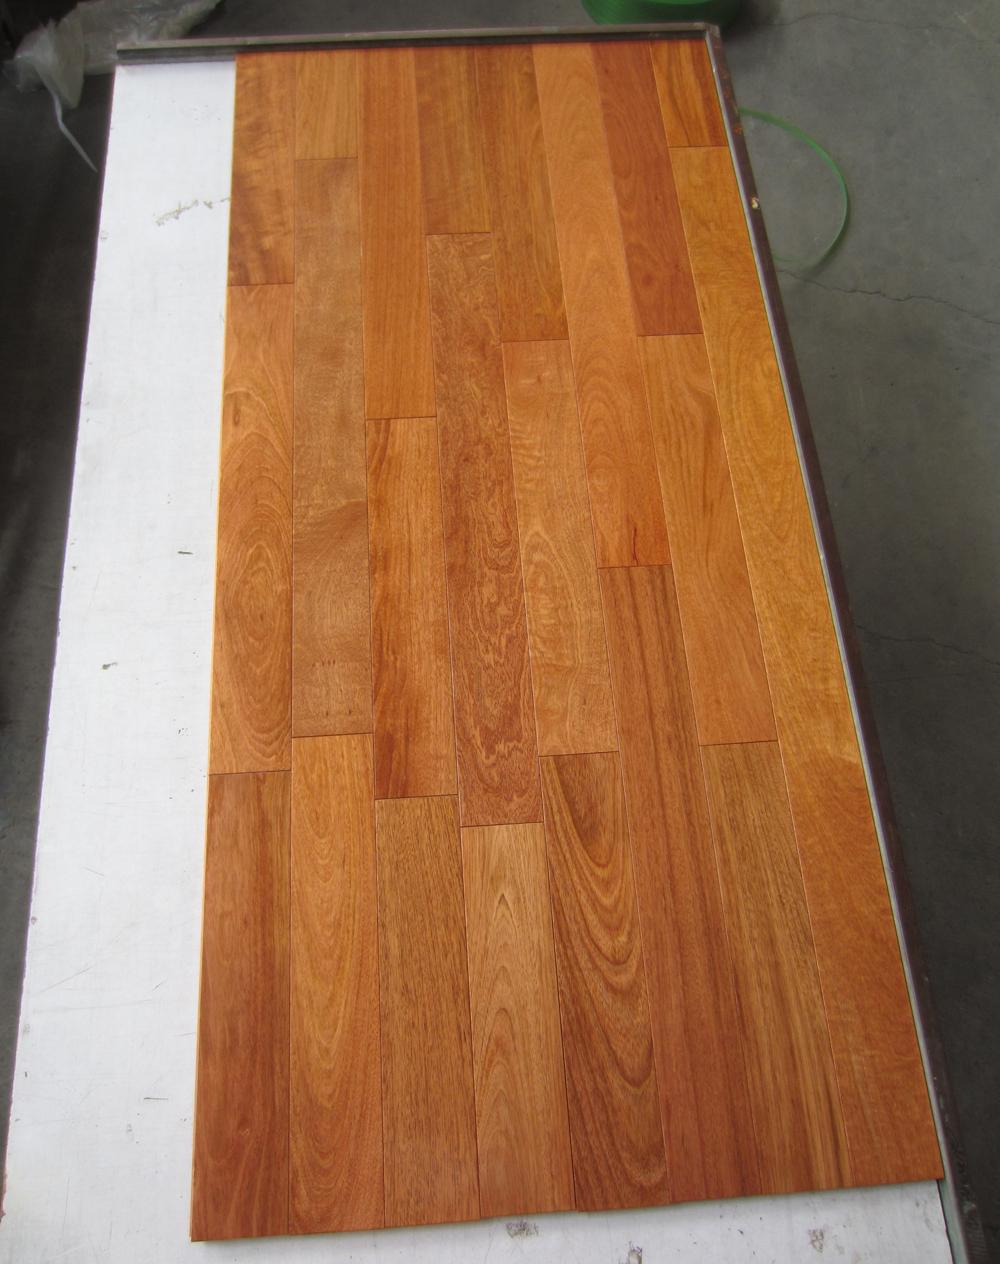 Jatoba brazilian cherry solid hardwood flooring buy for Buy unfinished hardwood flooring